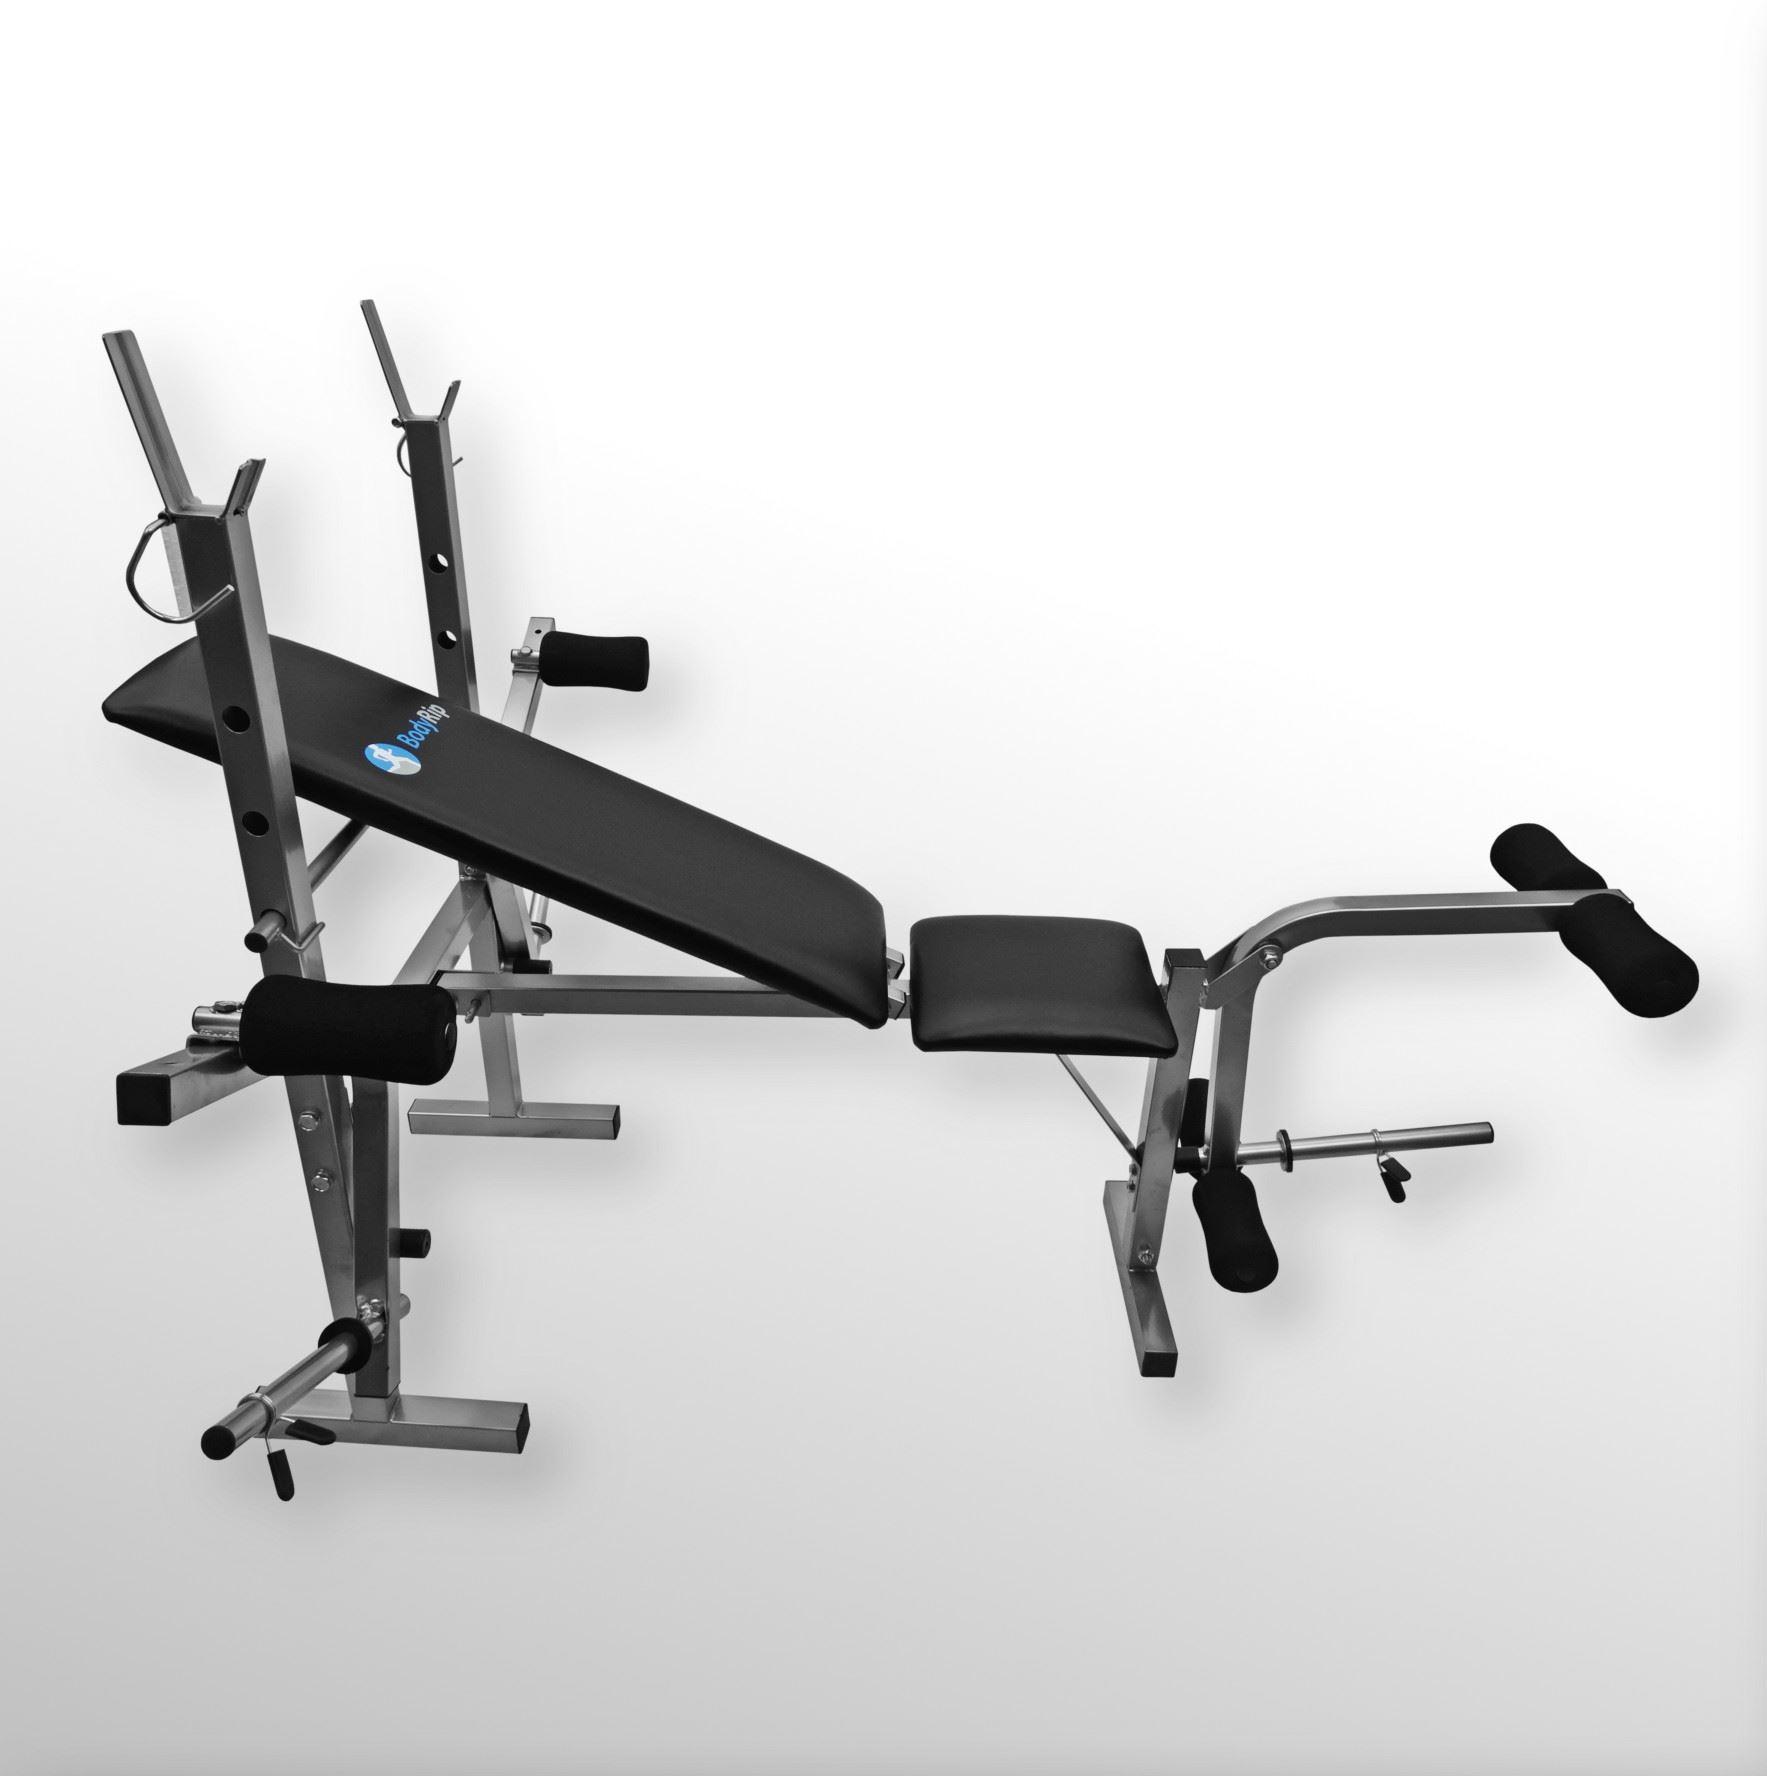 Bodyrip easy folding weight bench rack incline